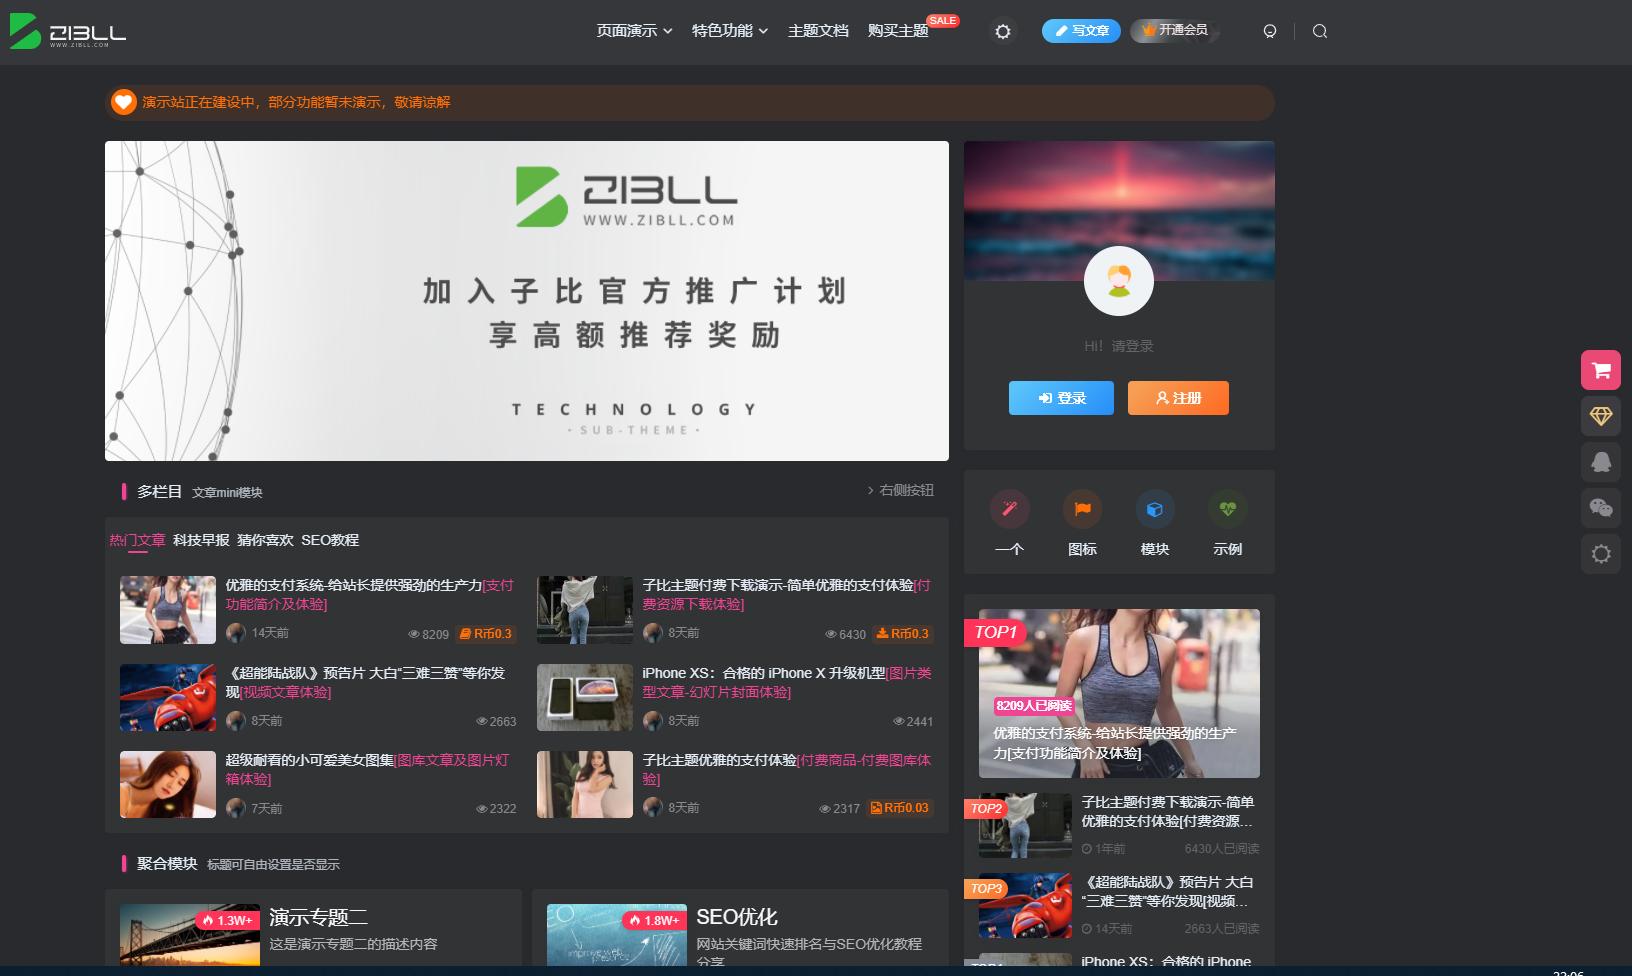 Zibll子比博客CMS WP主题模板-最新版本V5.1无限制免受权-91xihu